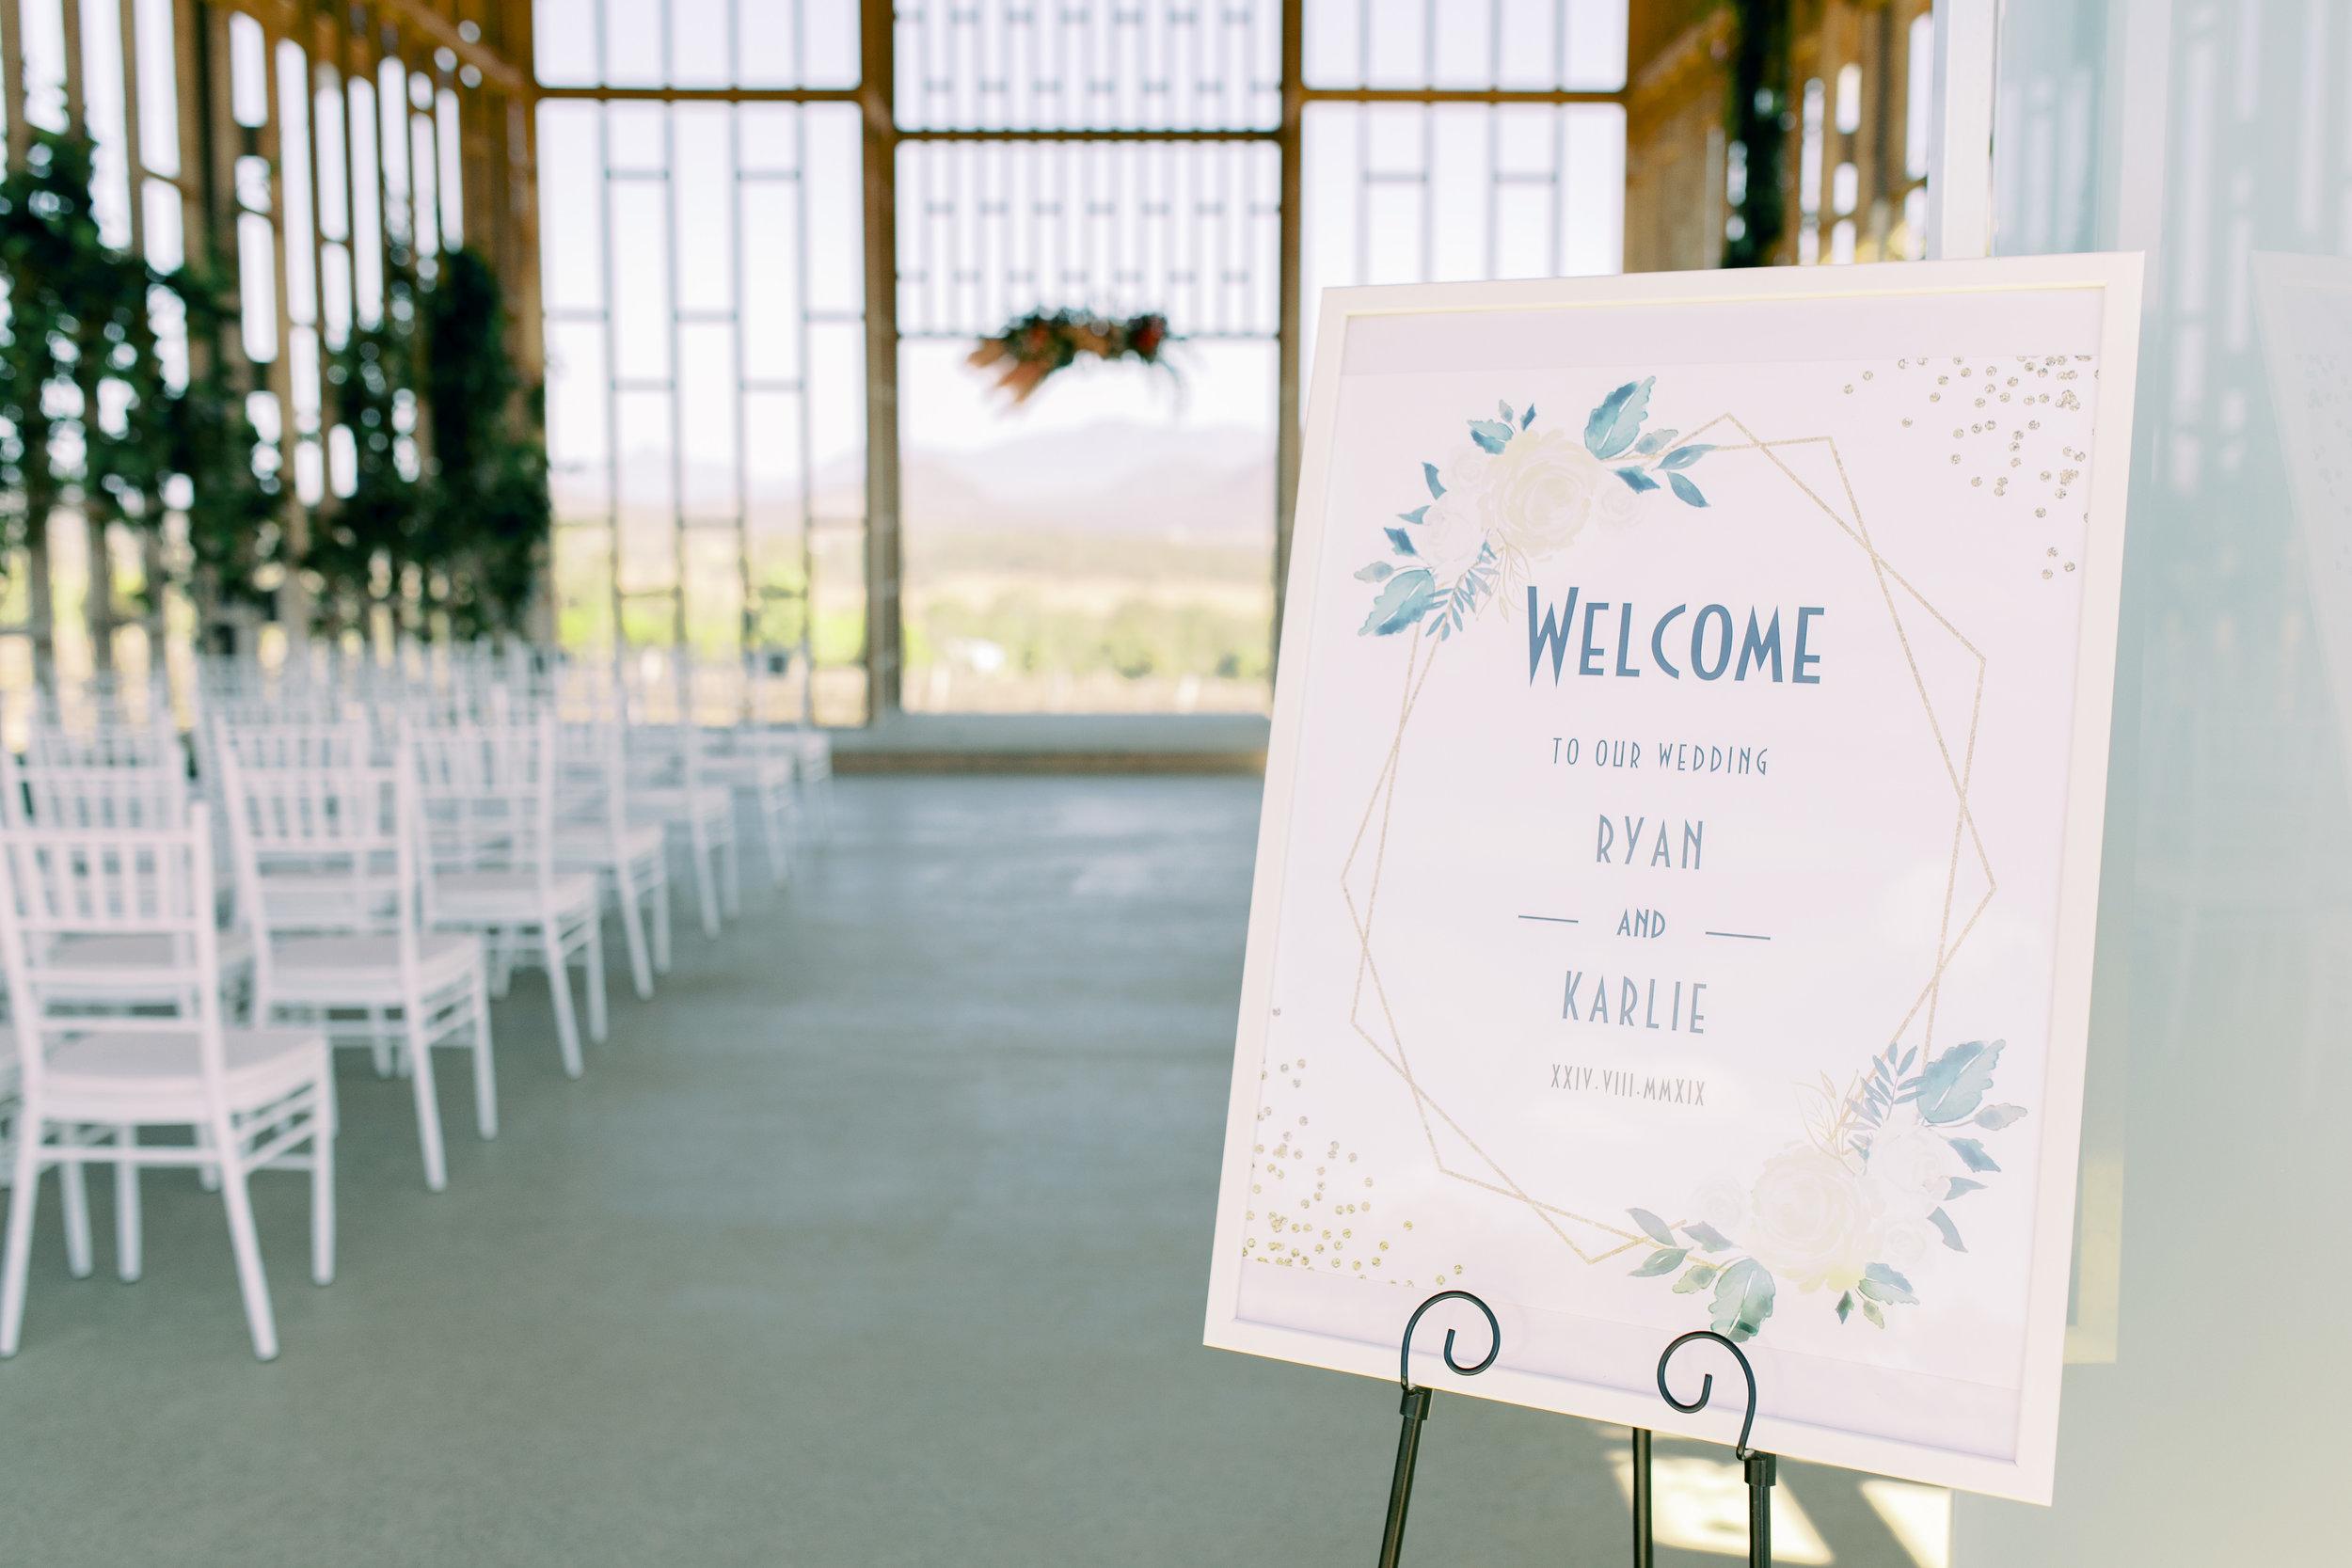 Kooroomba-Vineyard-Lavender-Farm-Wedding-Fine-Art-Lauren-Olivia-35.jpg